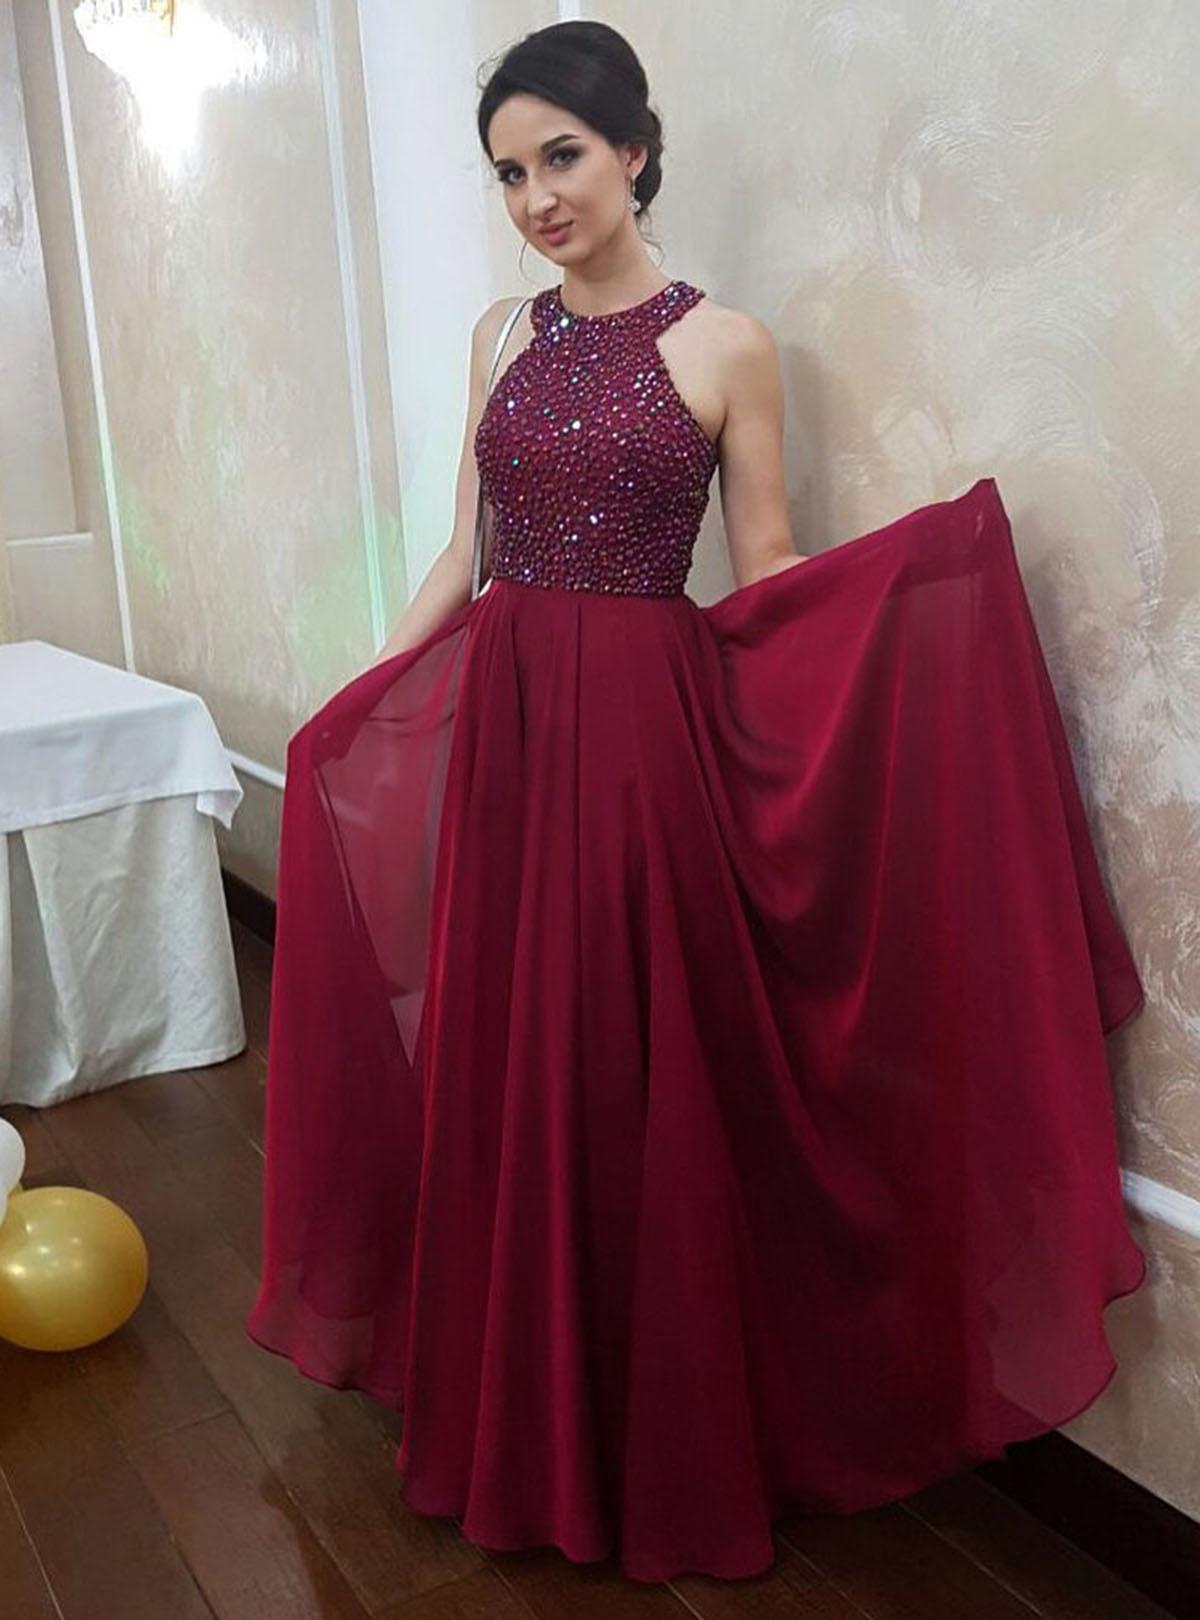 Sparkly Burgundy Chiffon Long Open Back Beaded Senior Prom